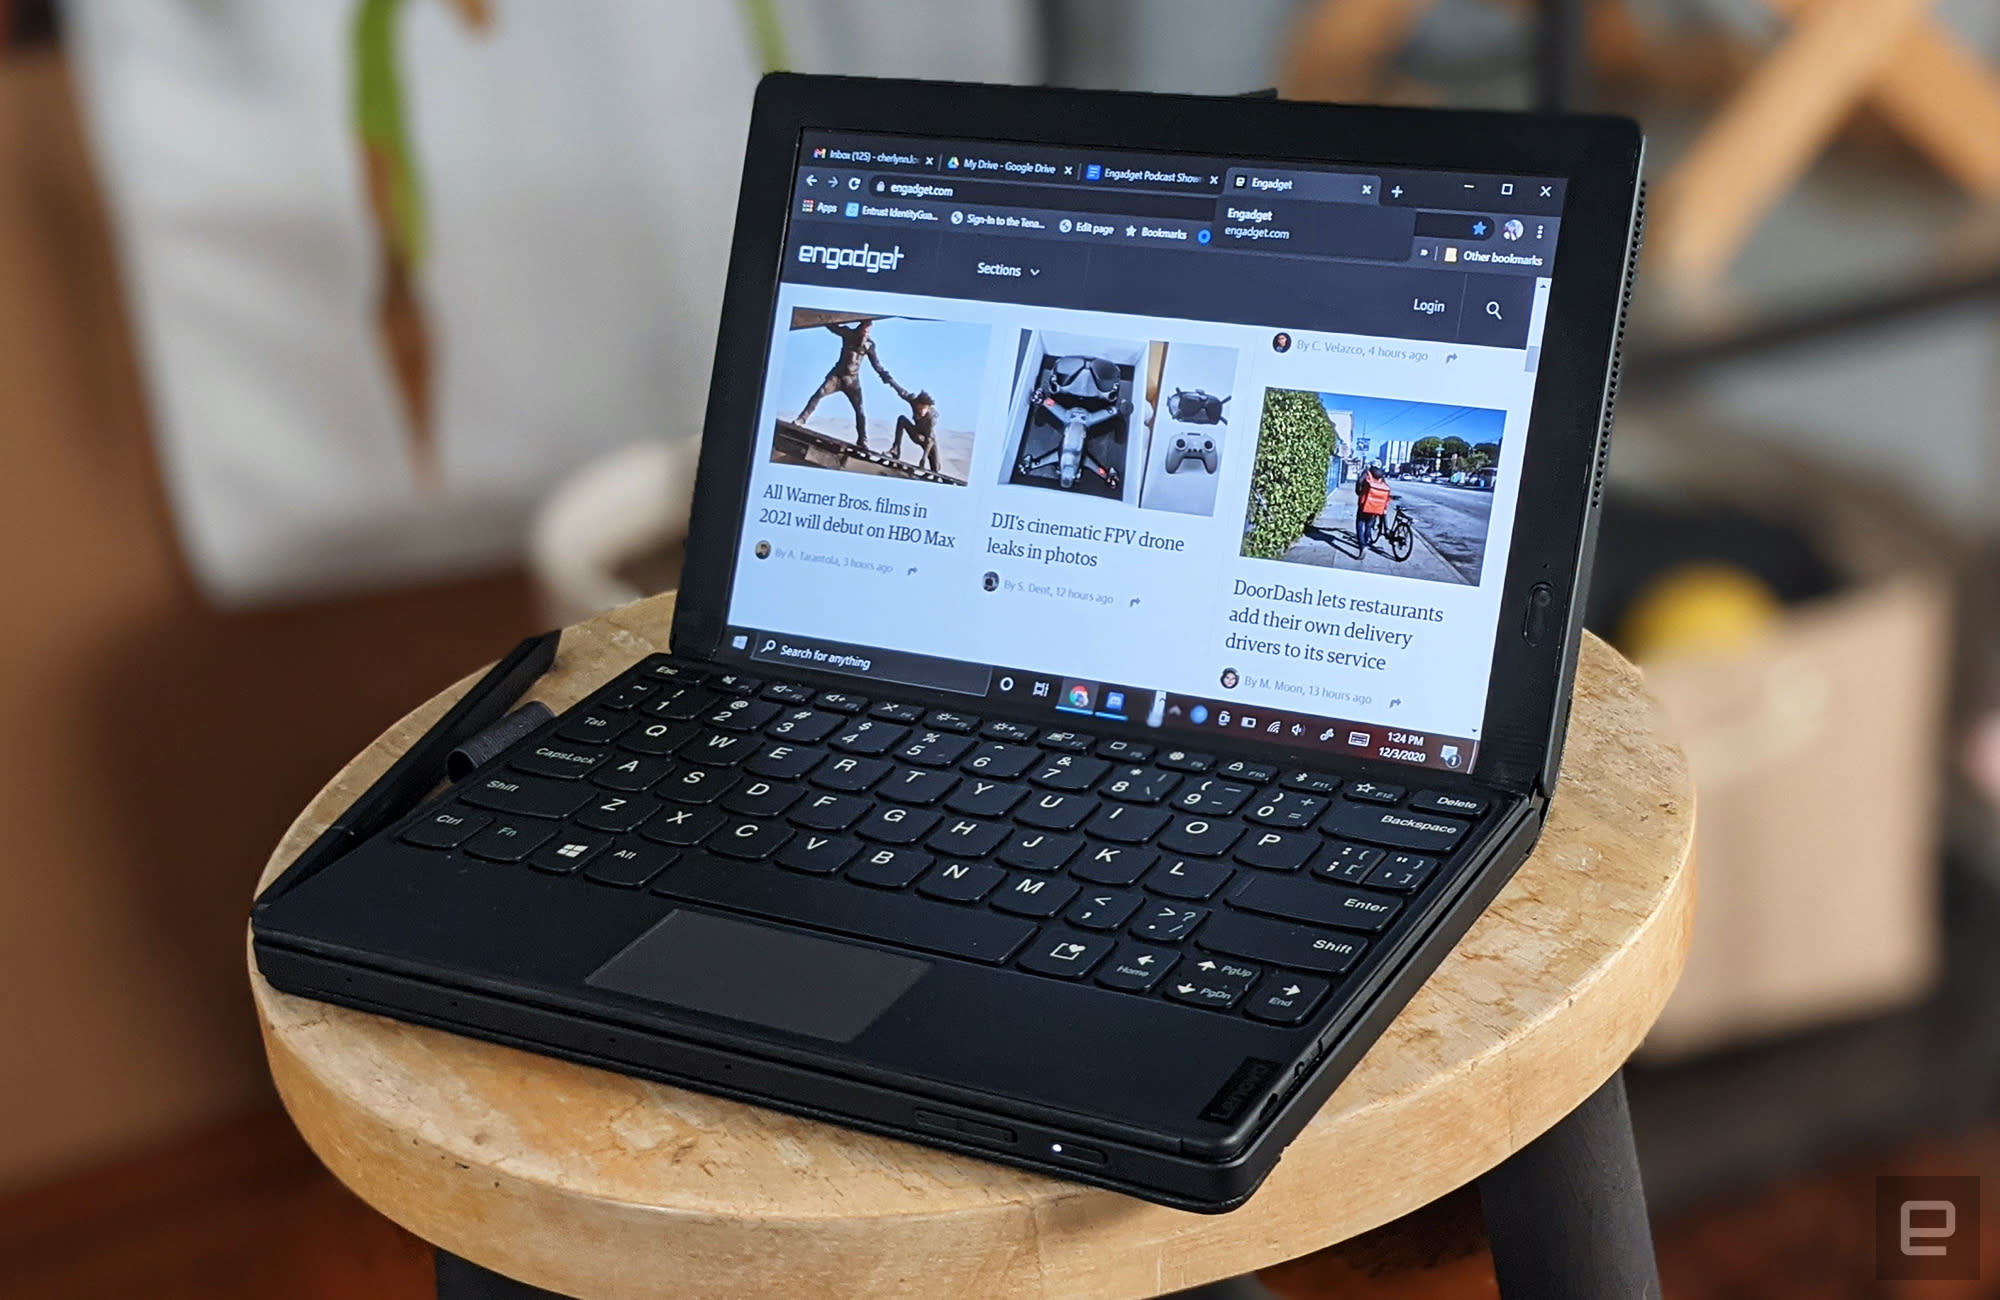 ThinkPad X1 Fold tablet/laptop displayed on a stool.